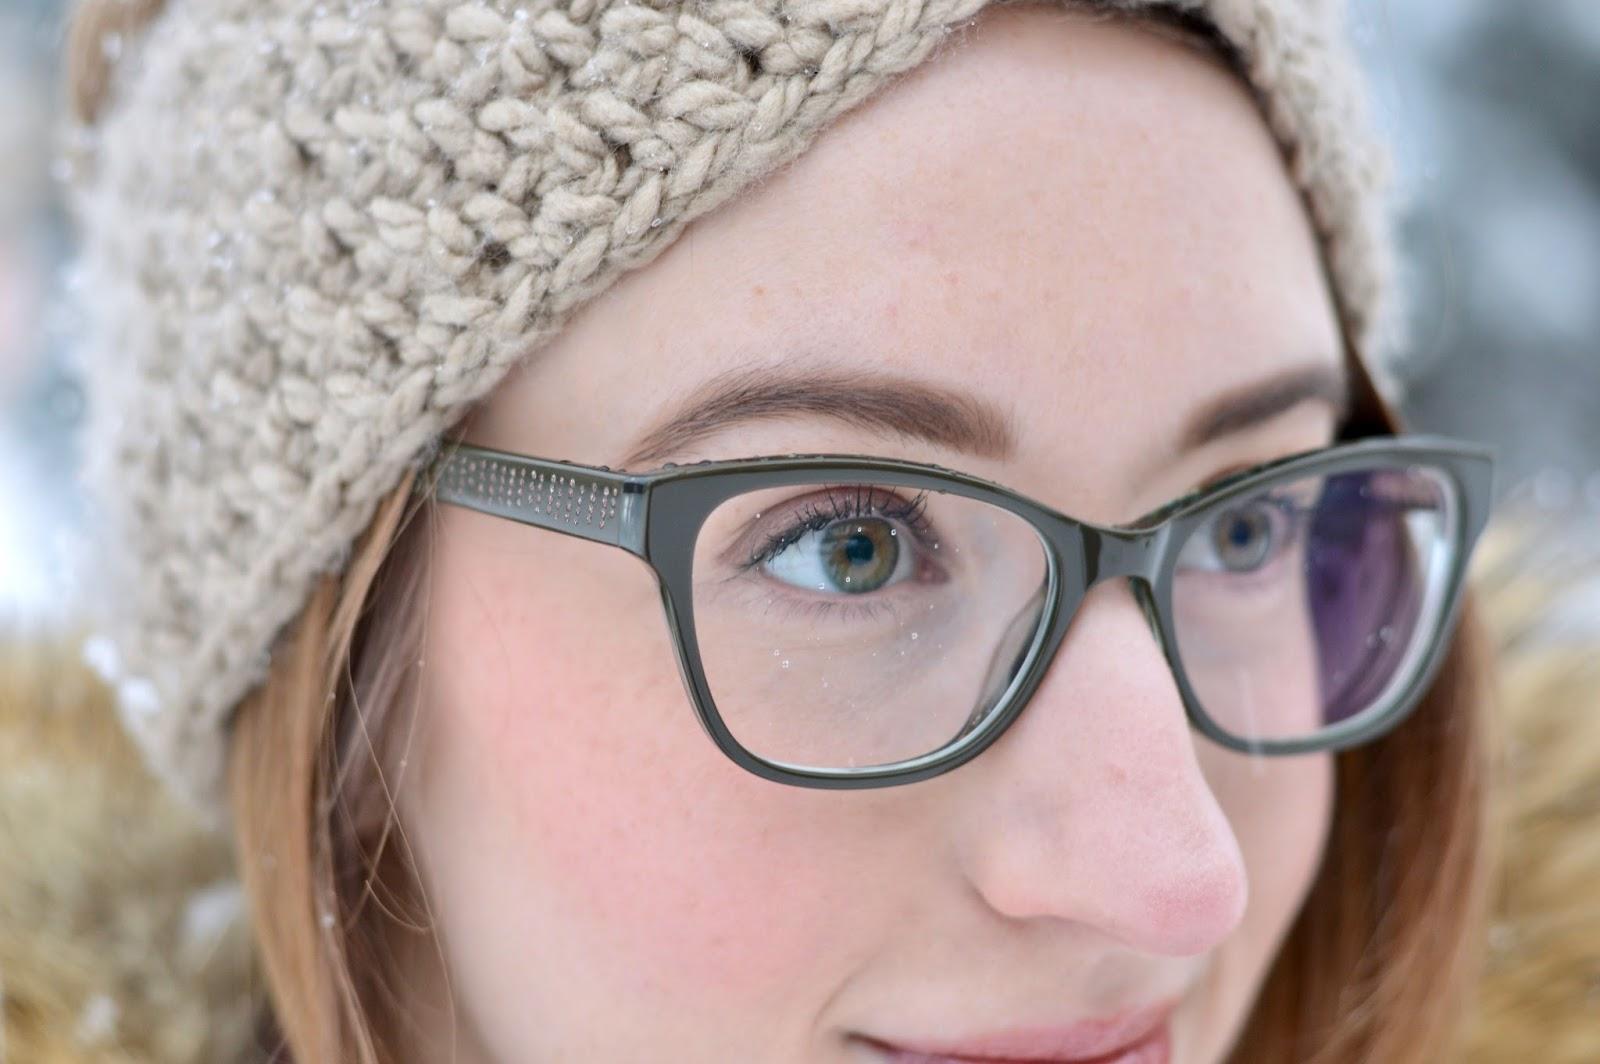 Michelle Lane Glasses